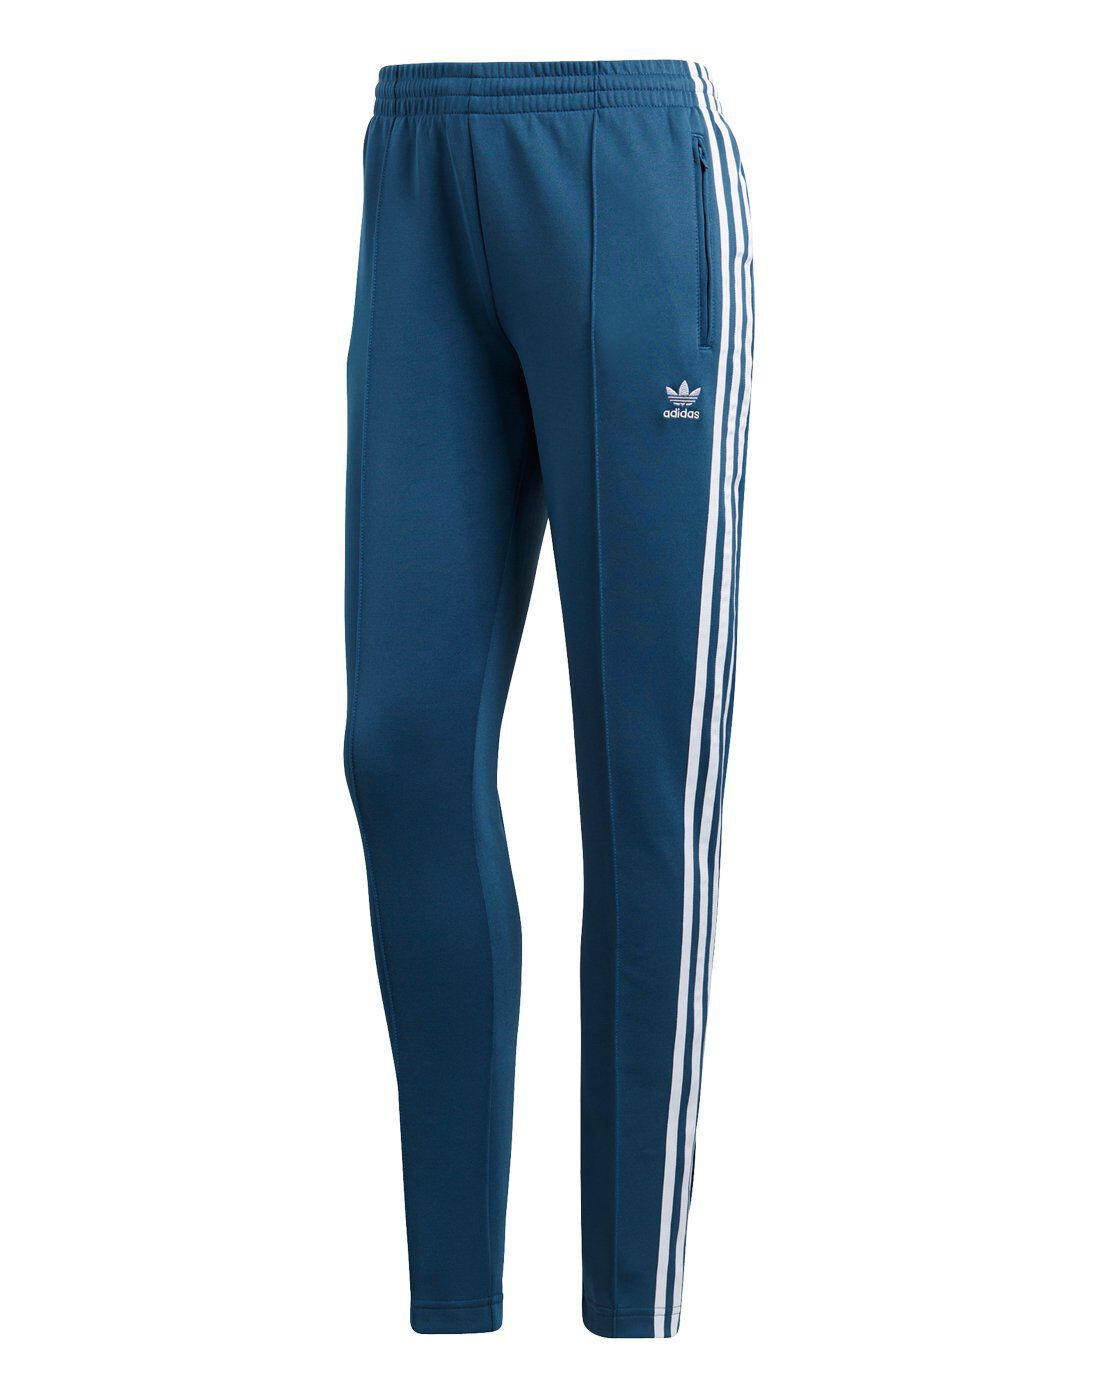 Women's Navy adidas Originals Superstar Track pants | Life